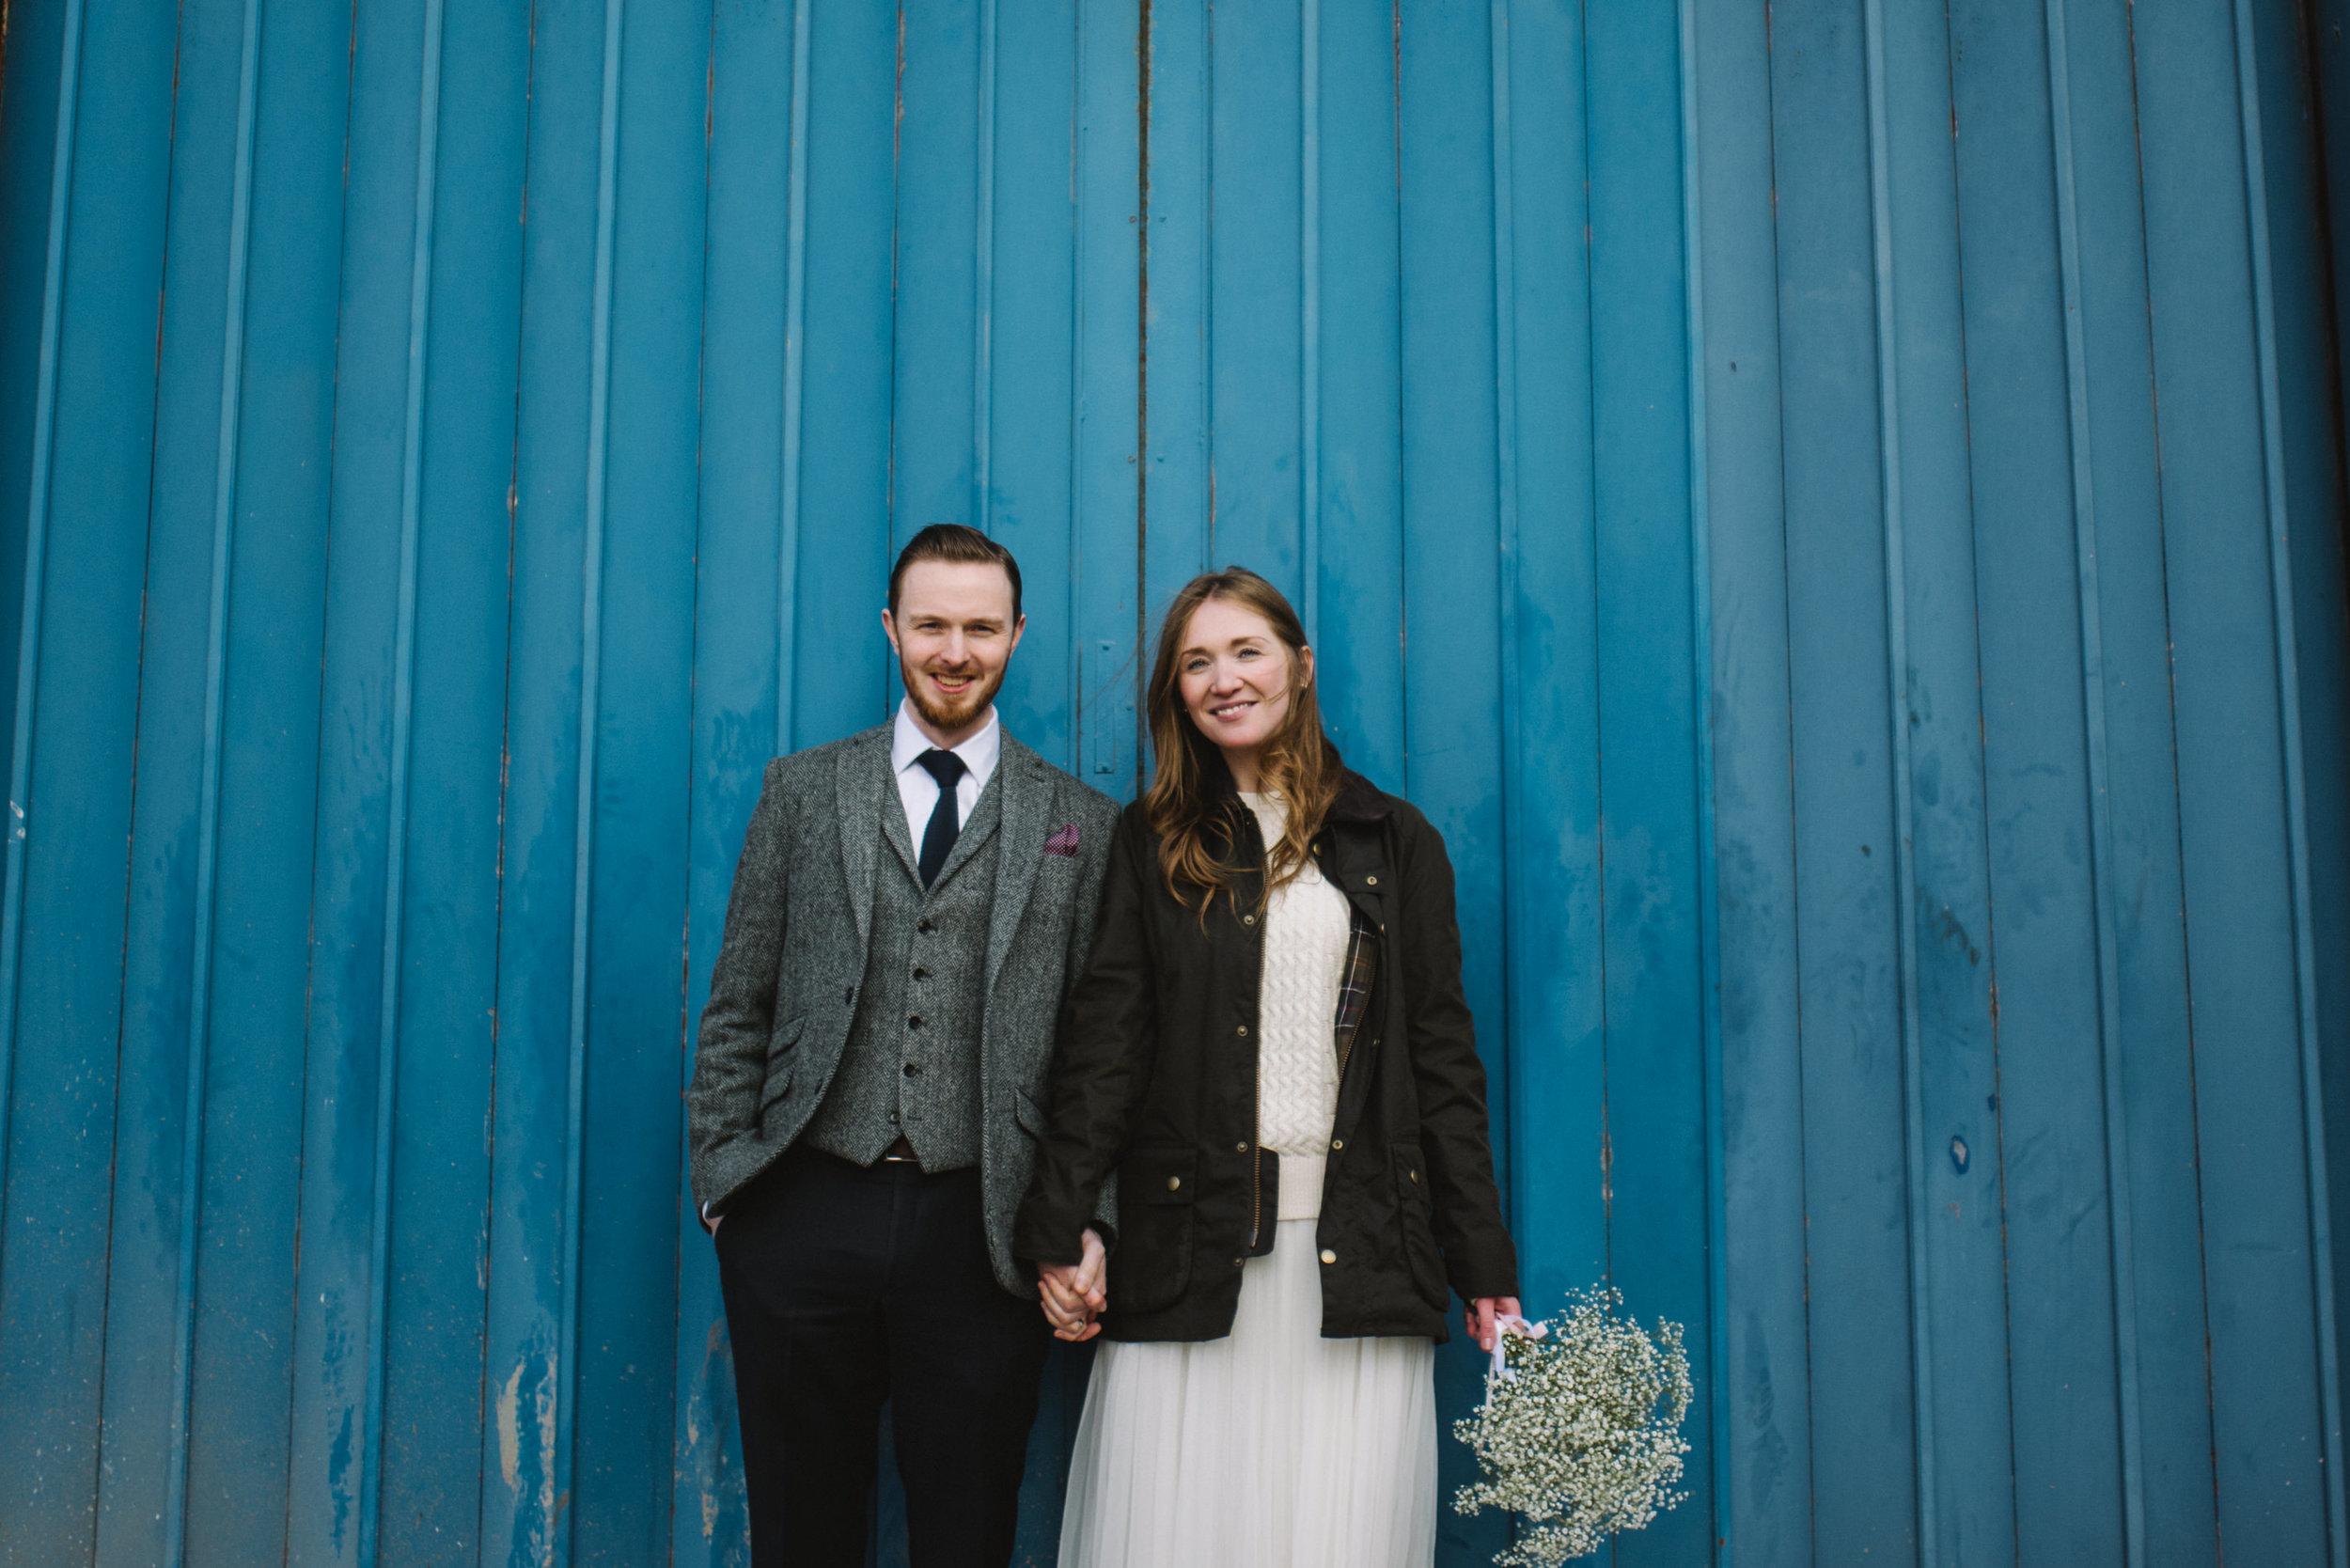 0037-LISA-DEVINE-PHOTOGRAPHY-ALTERNATIVE-WEDDING-PHOTOGRAPHY-SCOTLAND-DESTINATION-WEDDINGS-GLASGOW-WEDDINGS-COOL-WEDDINGS-STYLISH-WEDDINGS.JPG